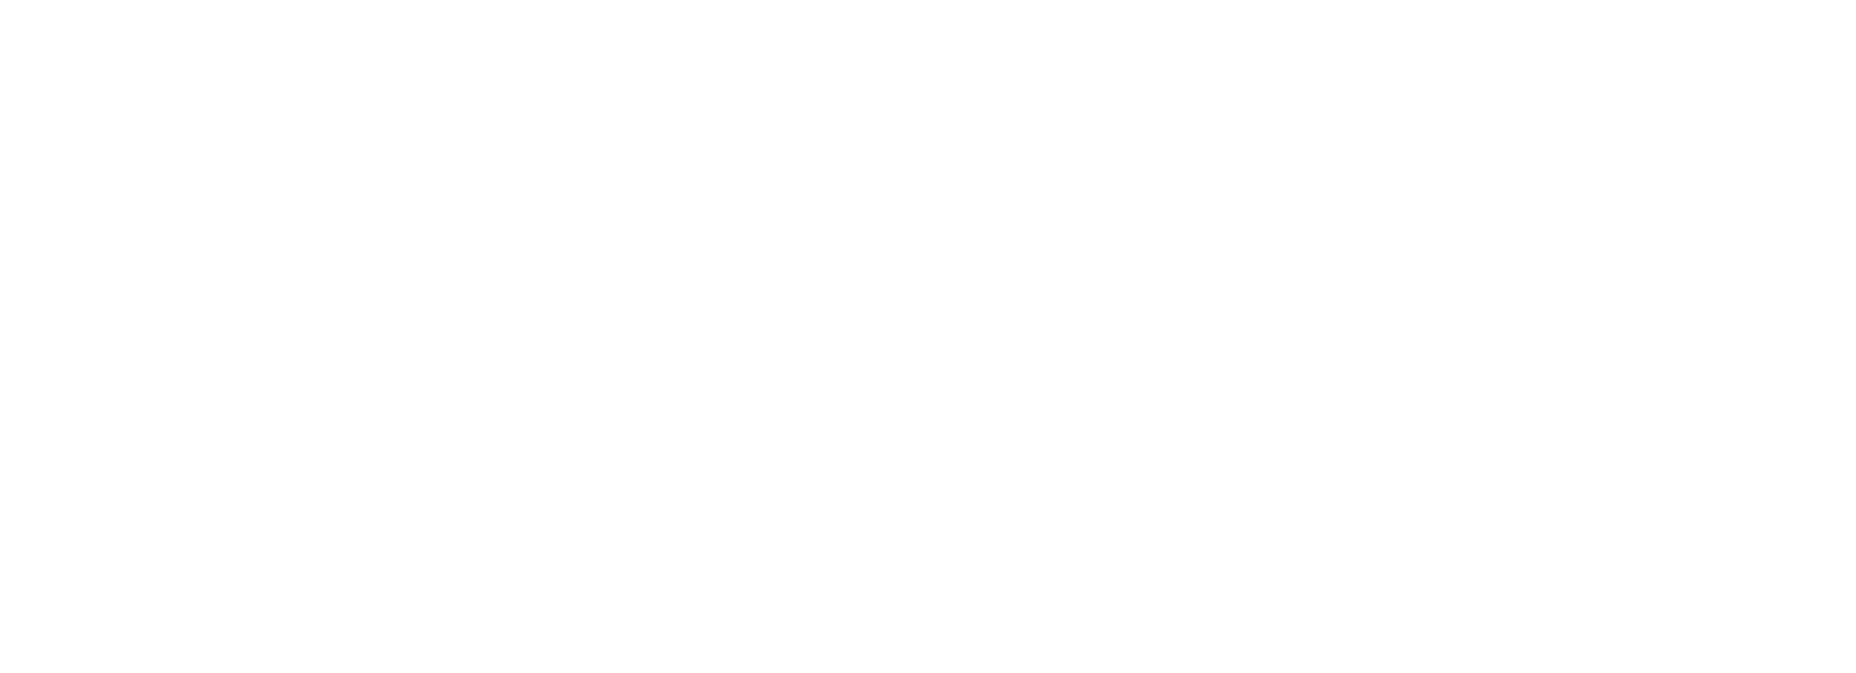 Adlers_logo_2019_white.png